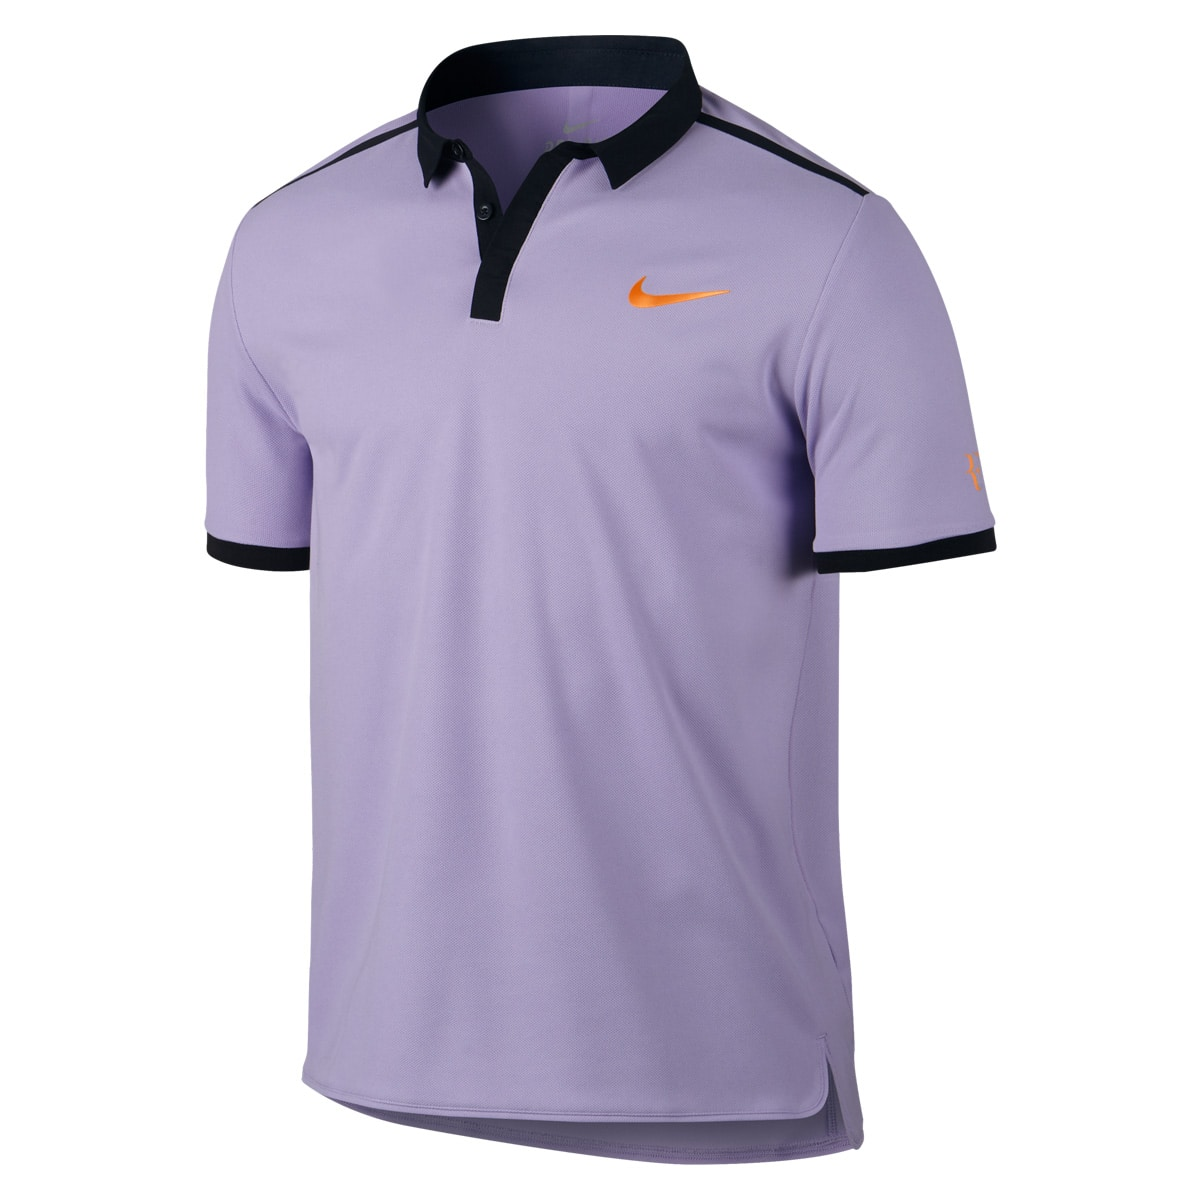 c94967f85962b Roger Federer s Outfit for Madrid